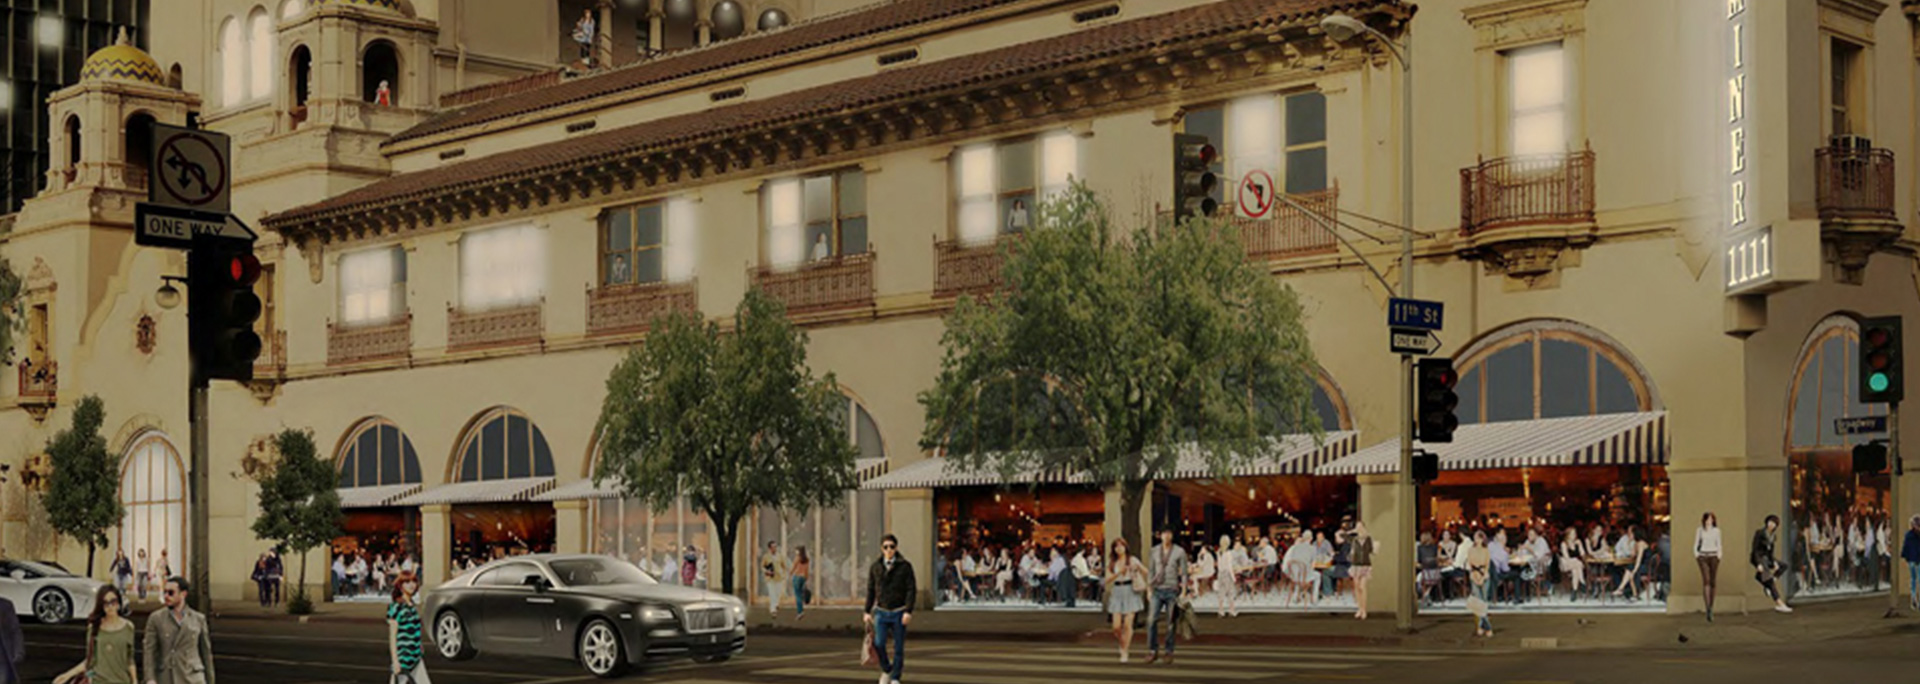 Herald Examiner renovation concept, Cronkite in LA